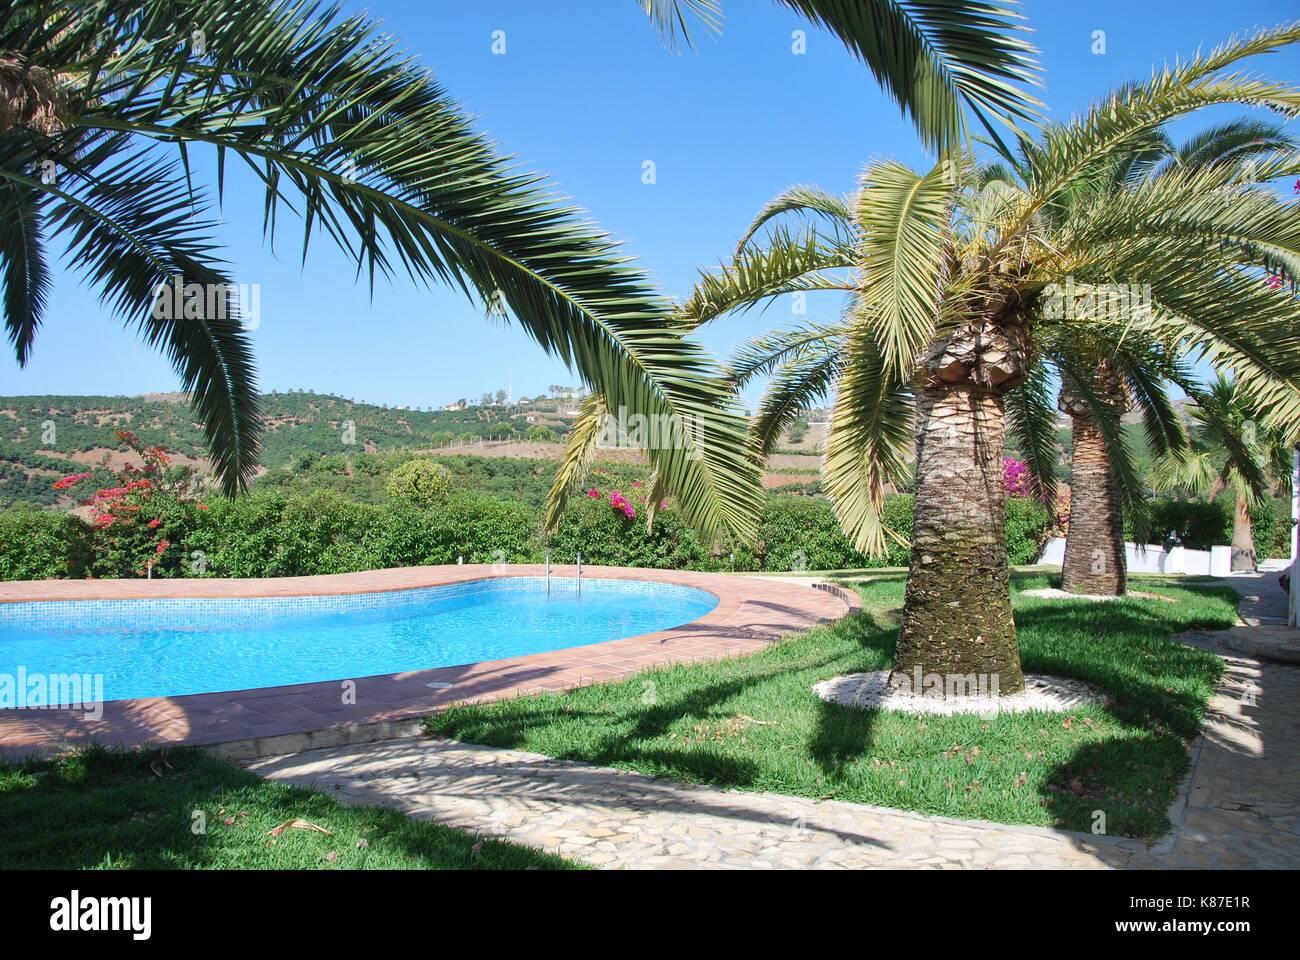 Malaga Spain - Stock Image